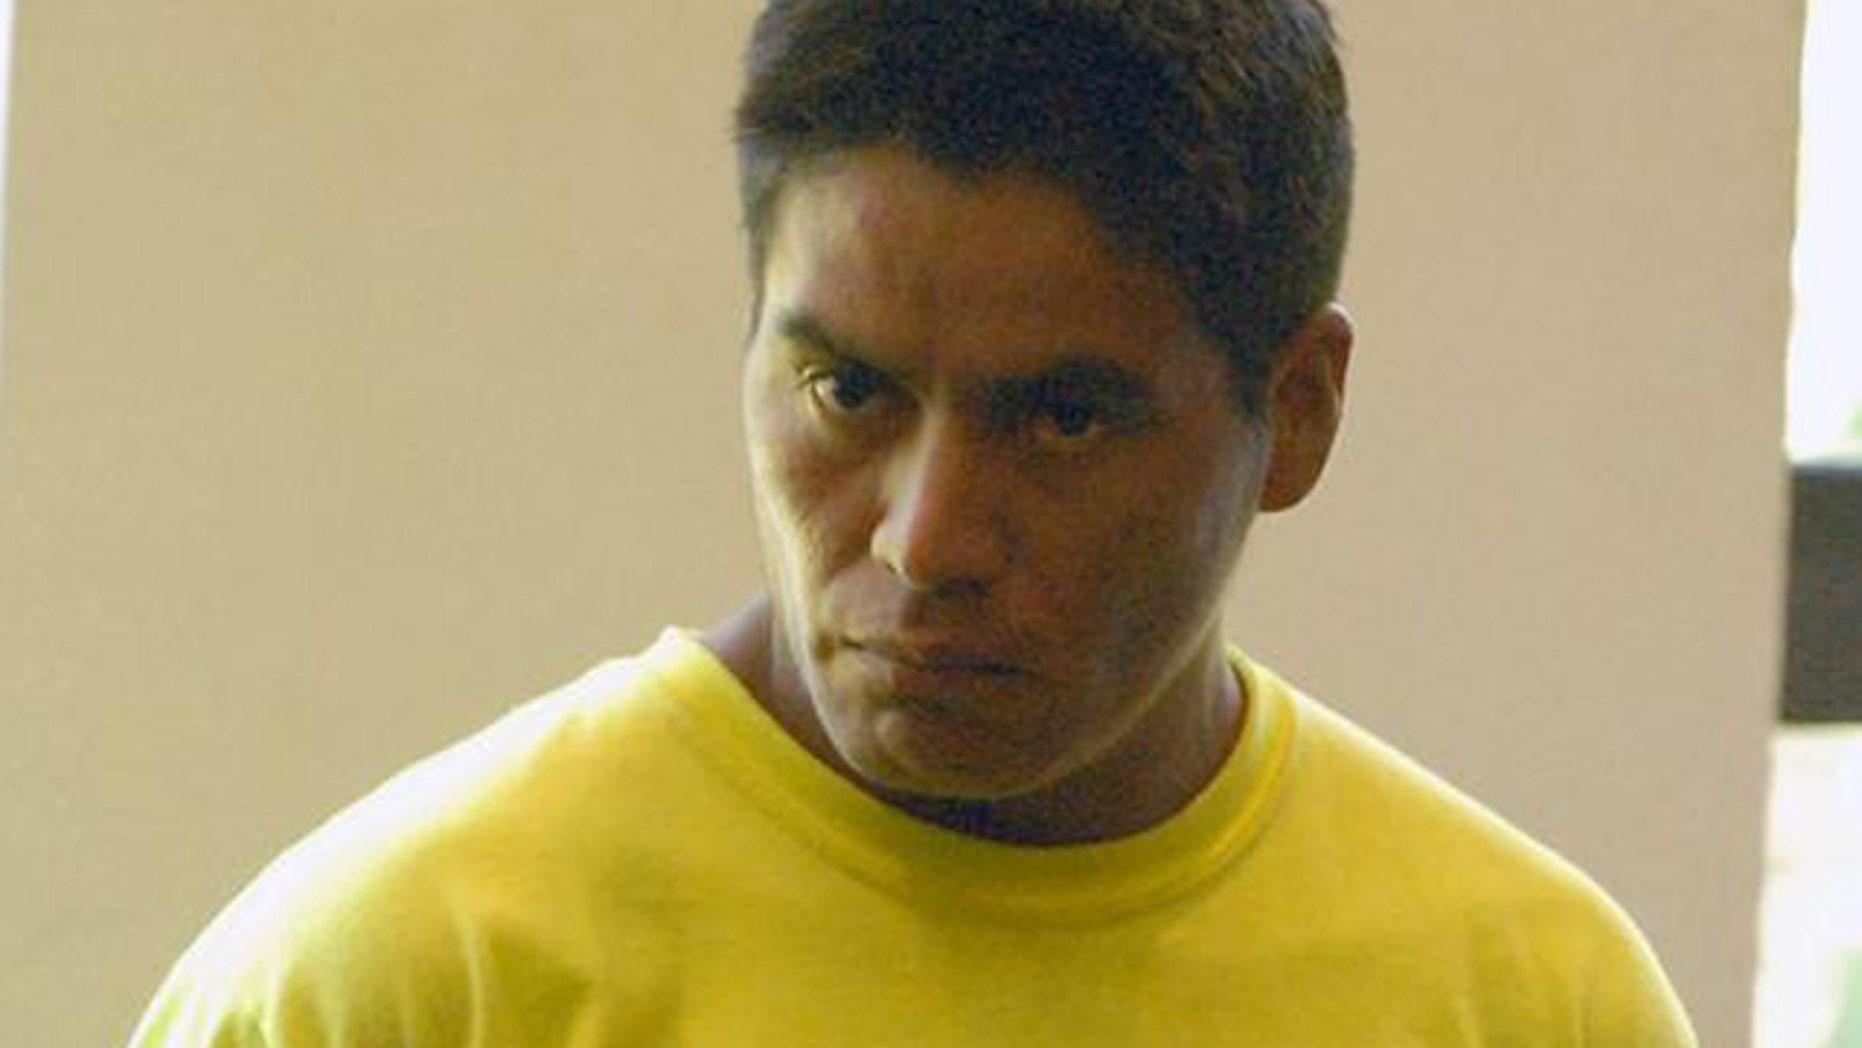 Aug. 22: Nicolas Dutan Guaman appears at Milford District Court.